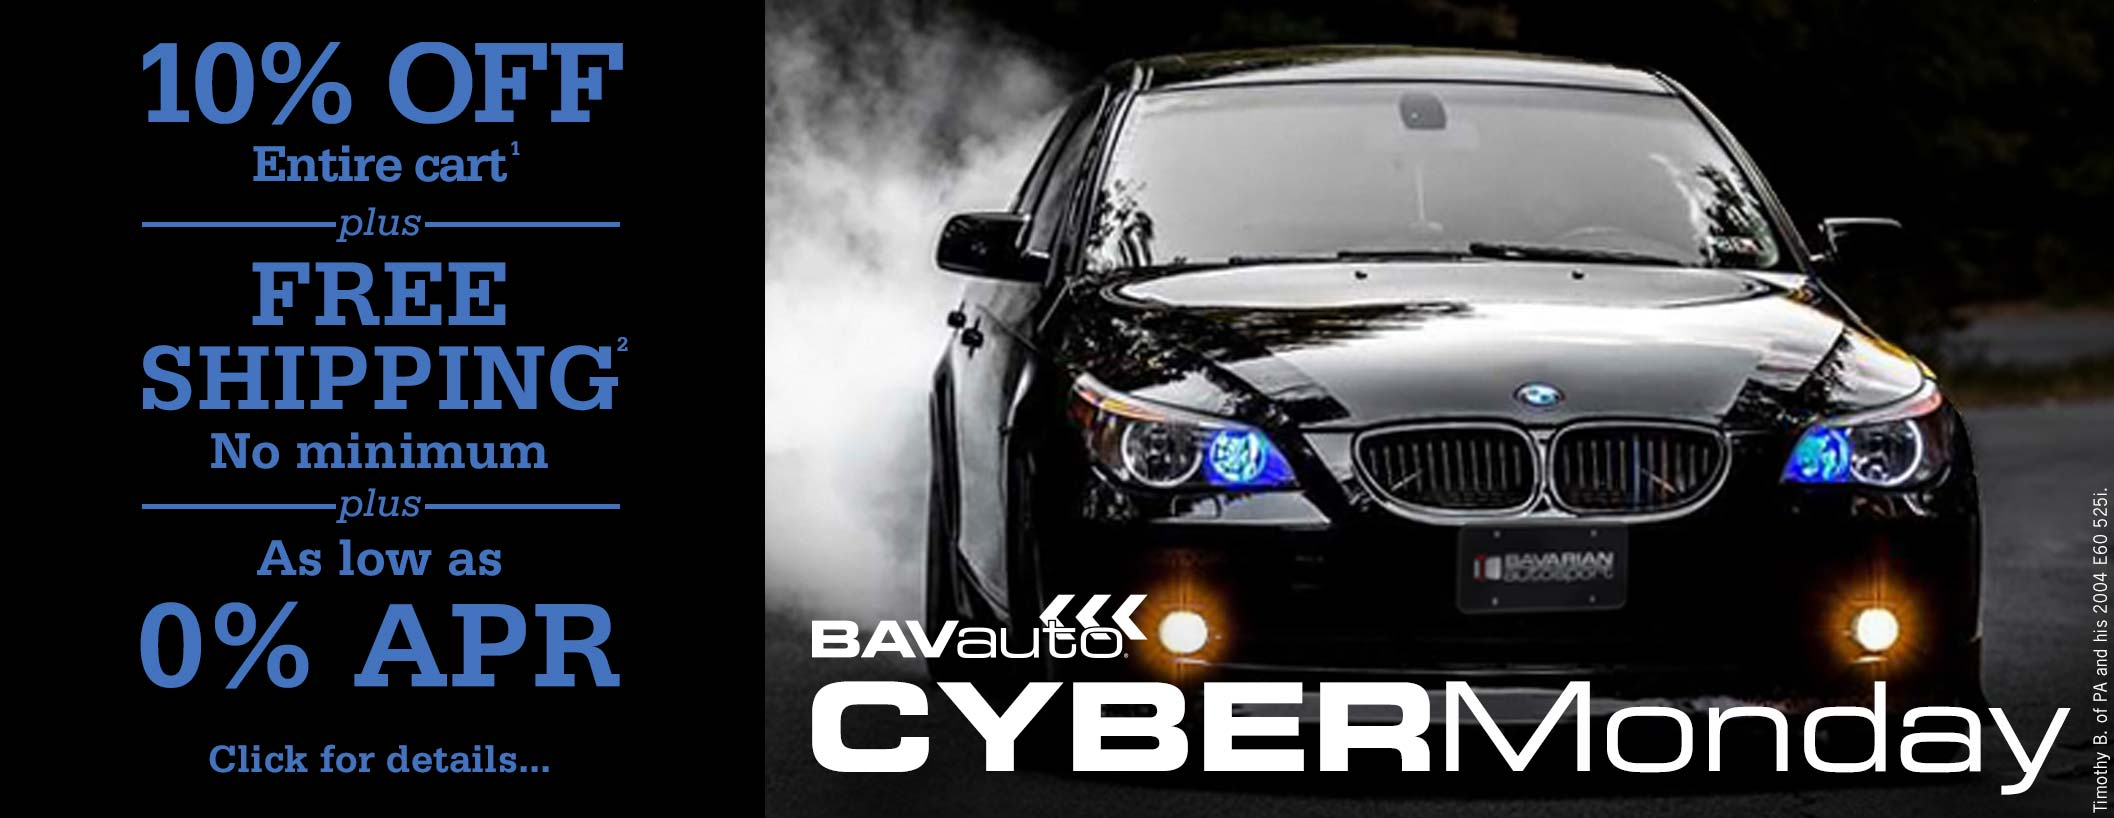 CyberMonday18Live_SlideDeck.jpg